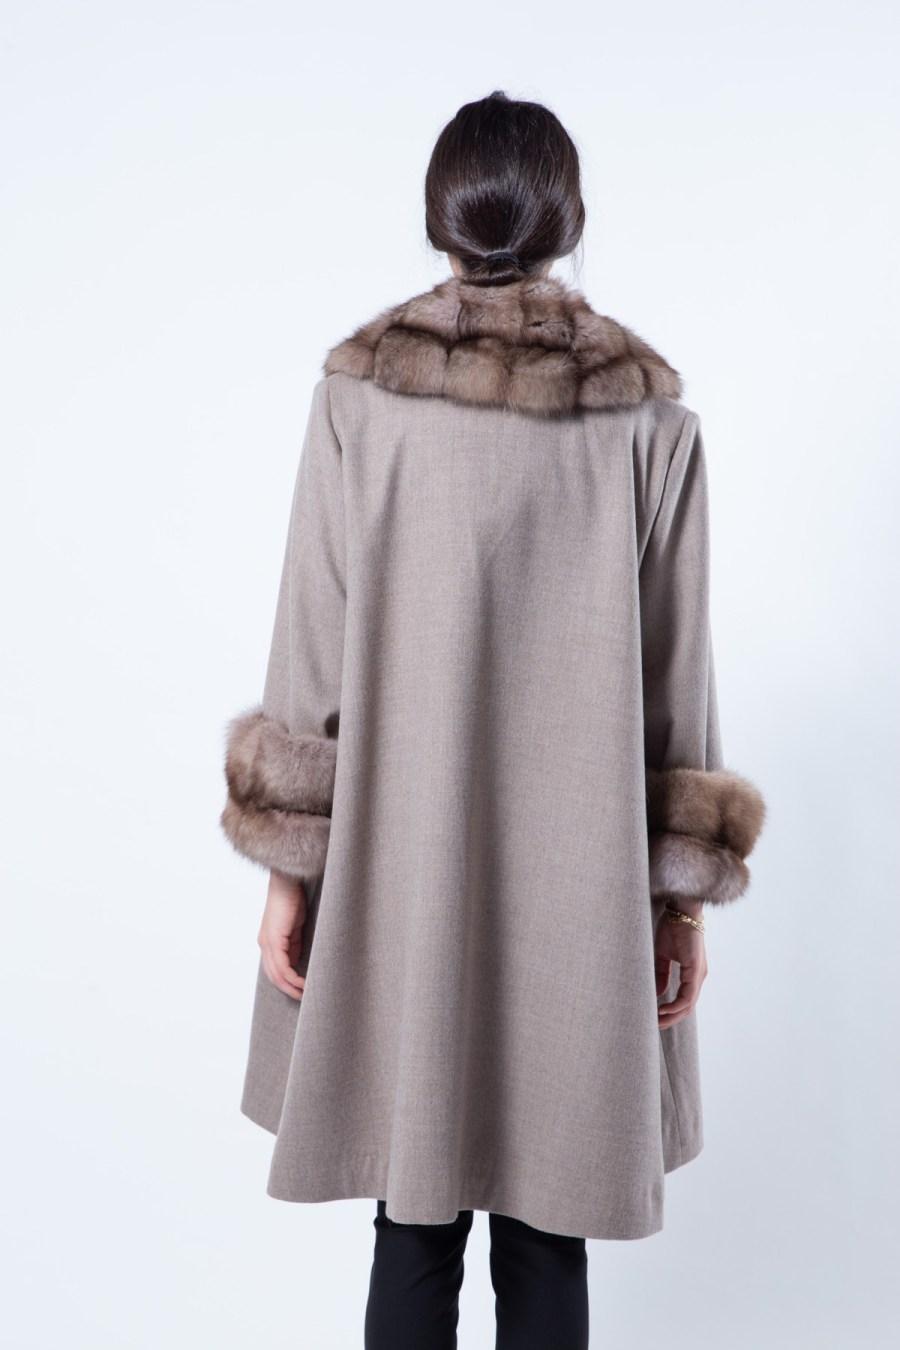 Cashmere Jacket with Beige Scuro Sable Fur-trim | Sarigianni Furs